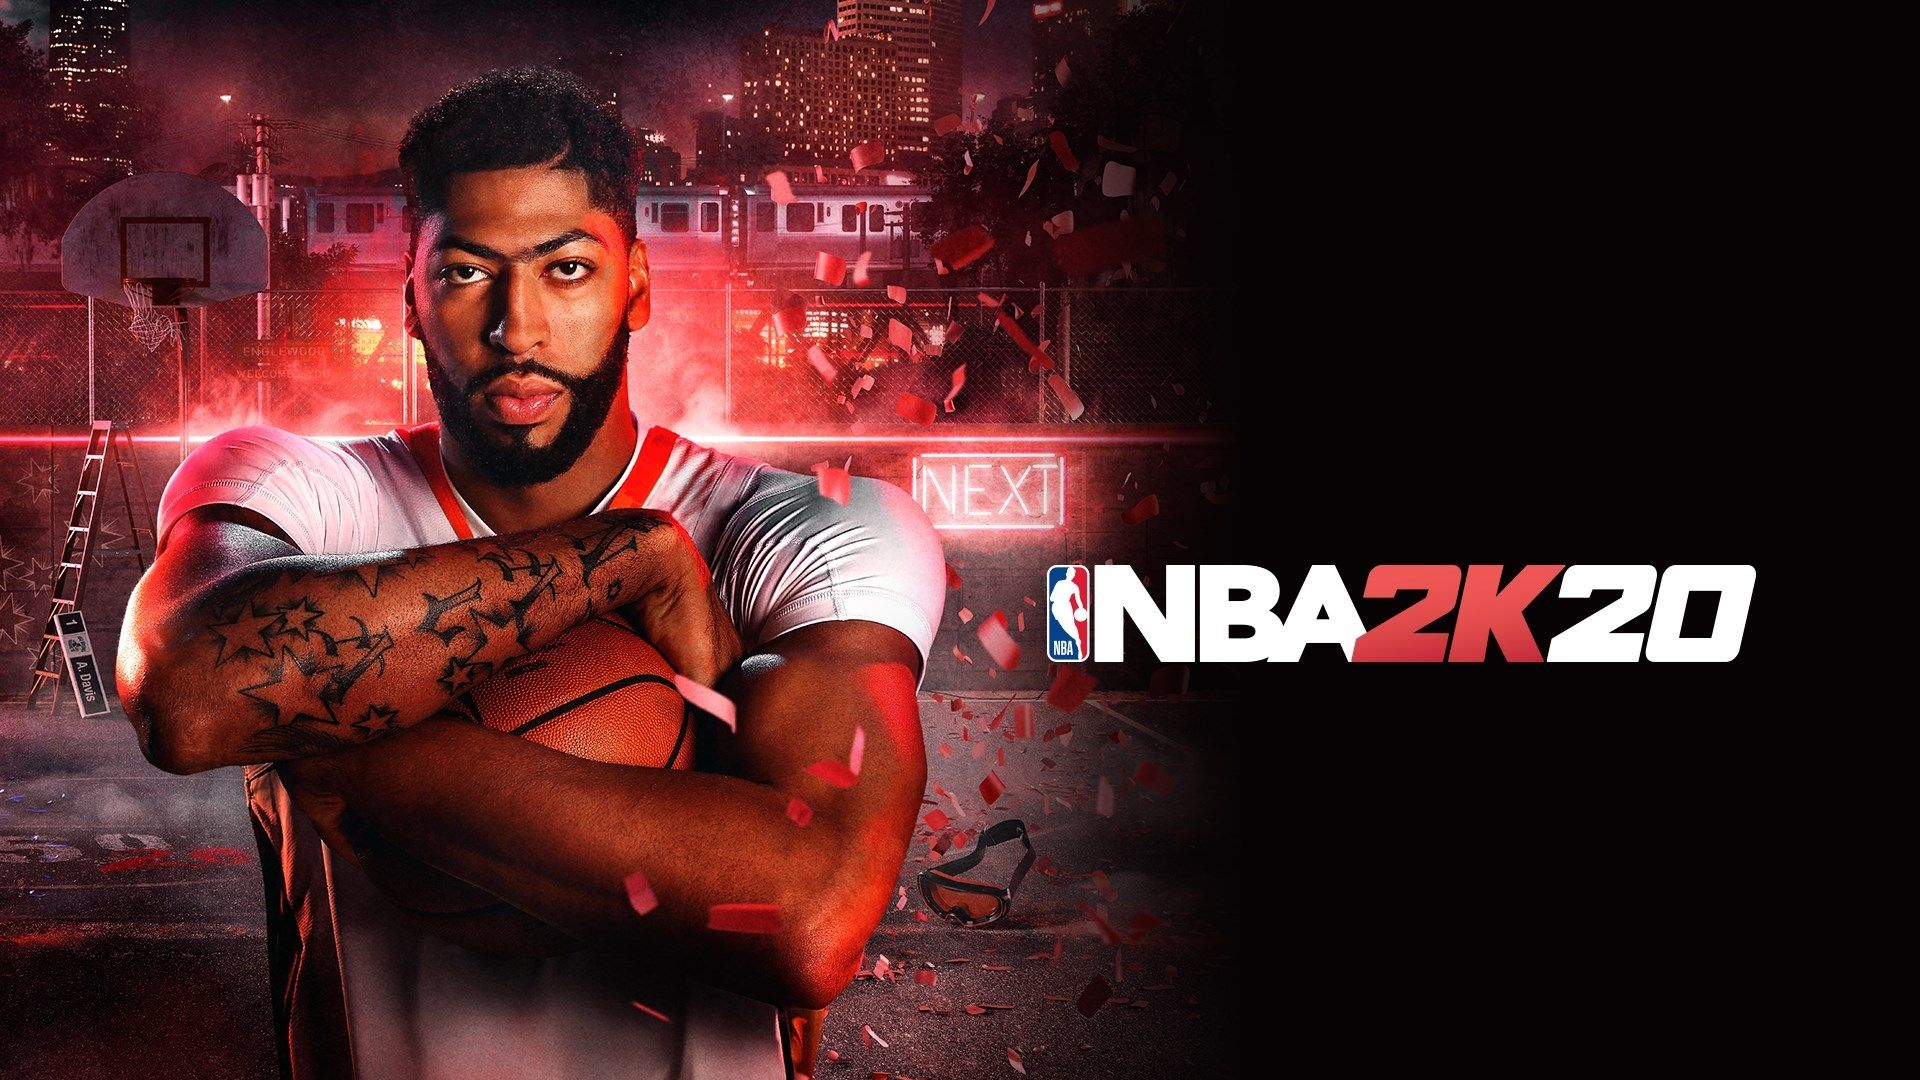 NBA 2K20 Wallpapers   Top NBA 2K20 Backgrounds   WallpaperAccess 1920x1080